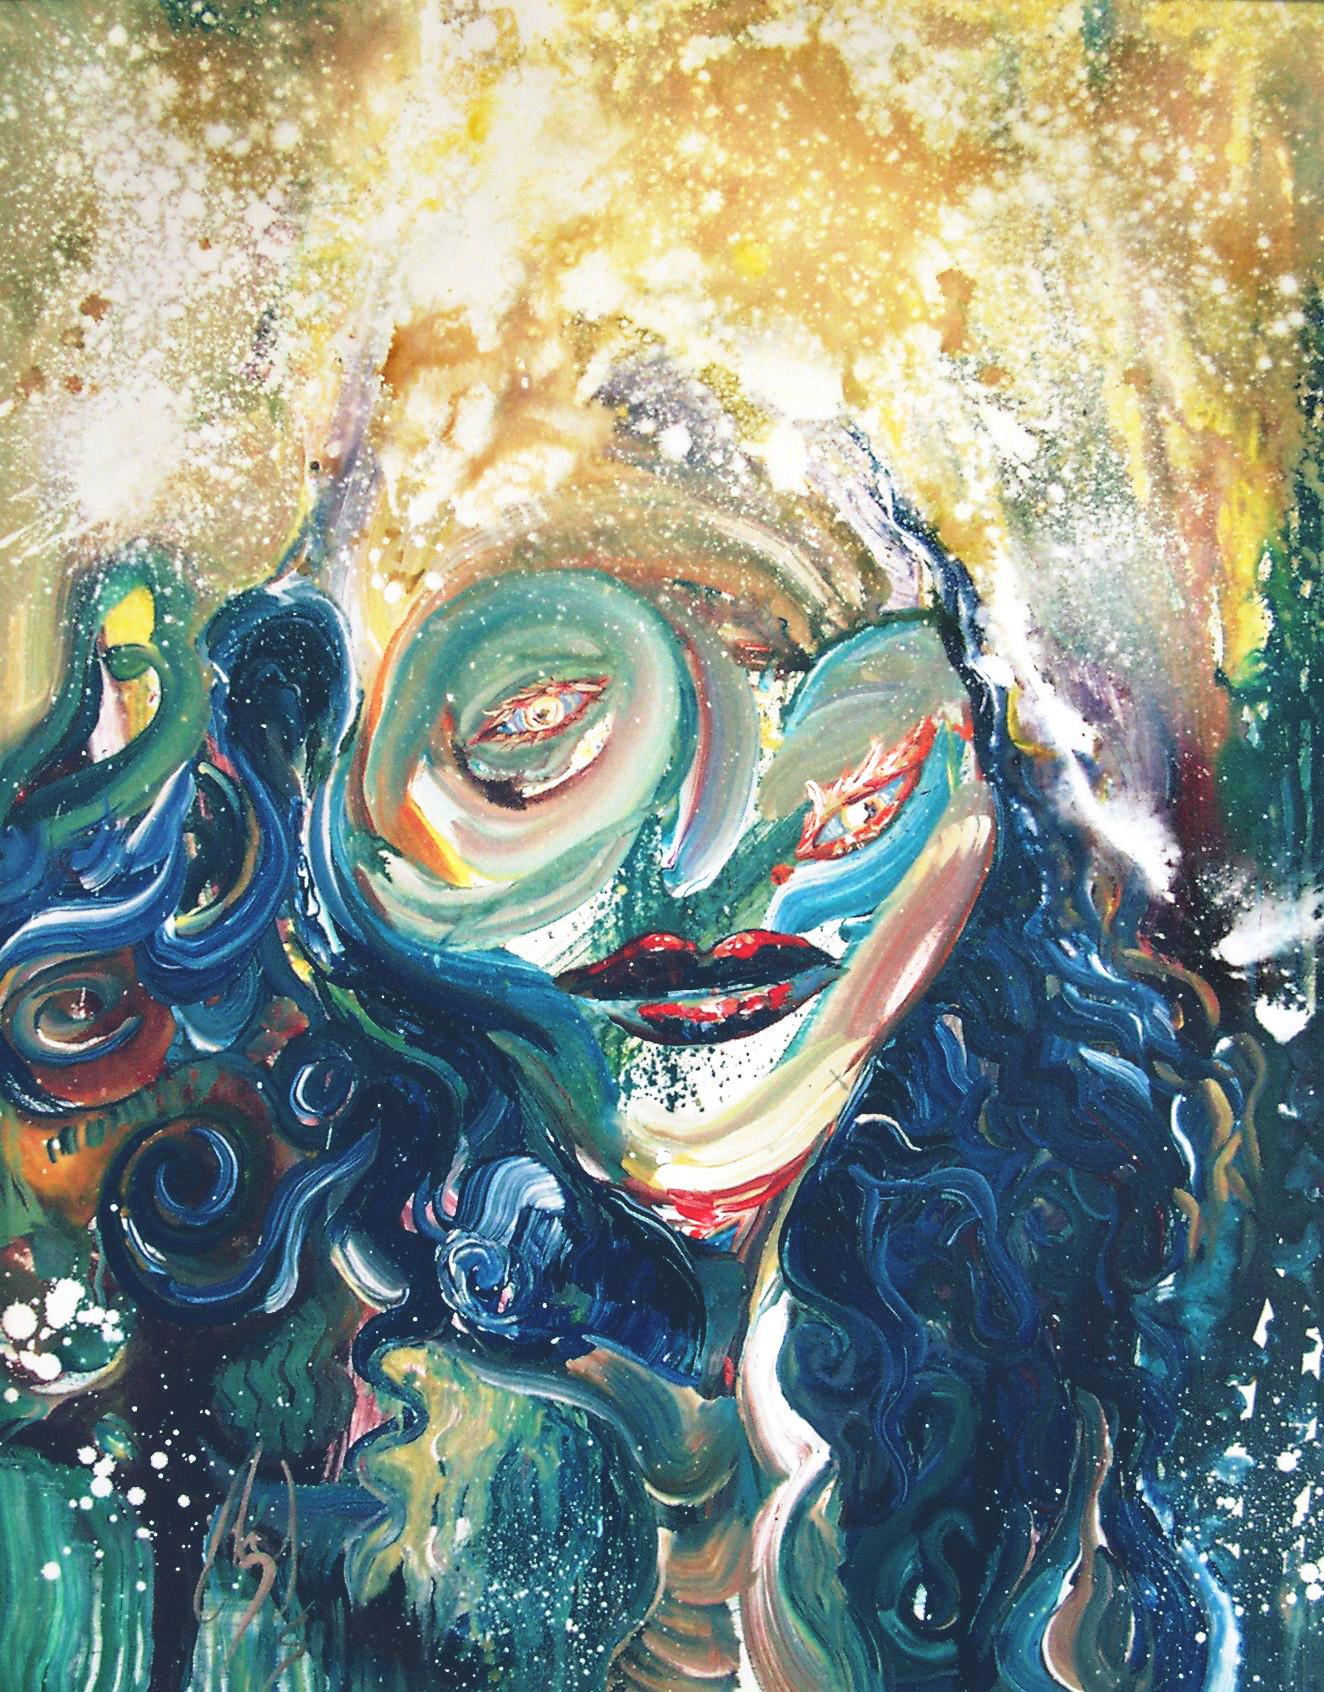 LOVELY WOMAN - 30 x 24, acrylic on canvas